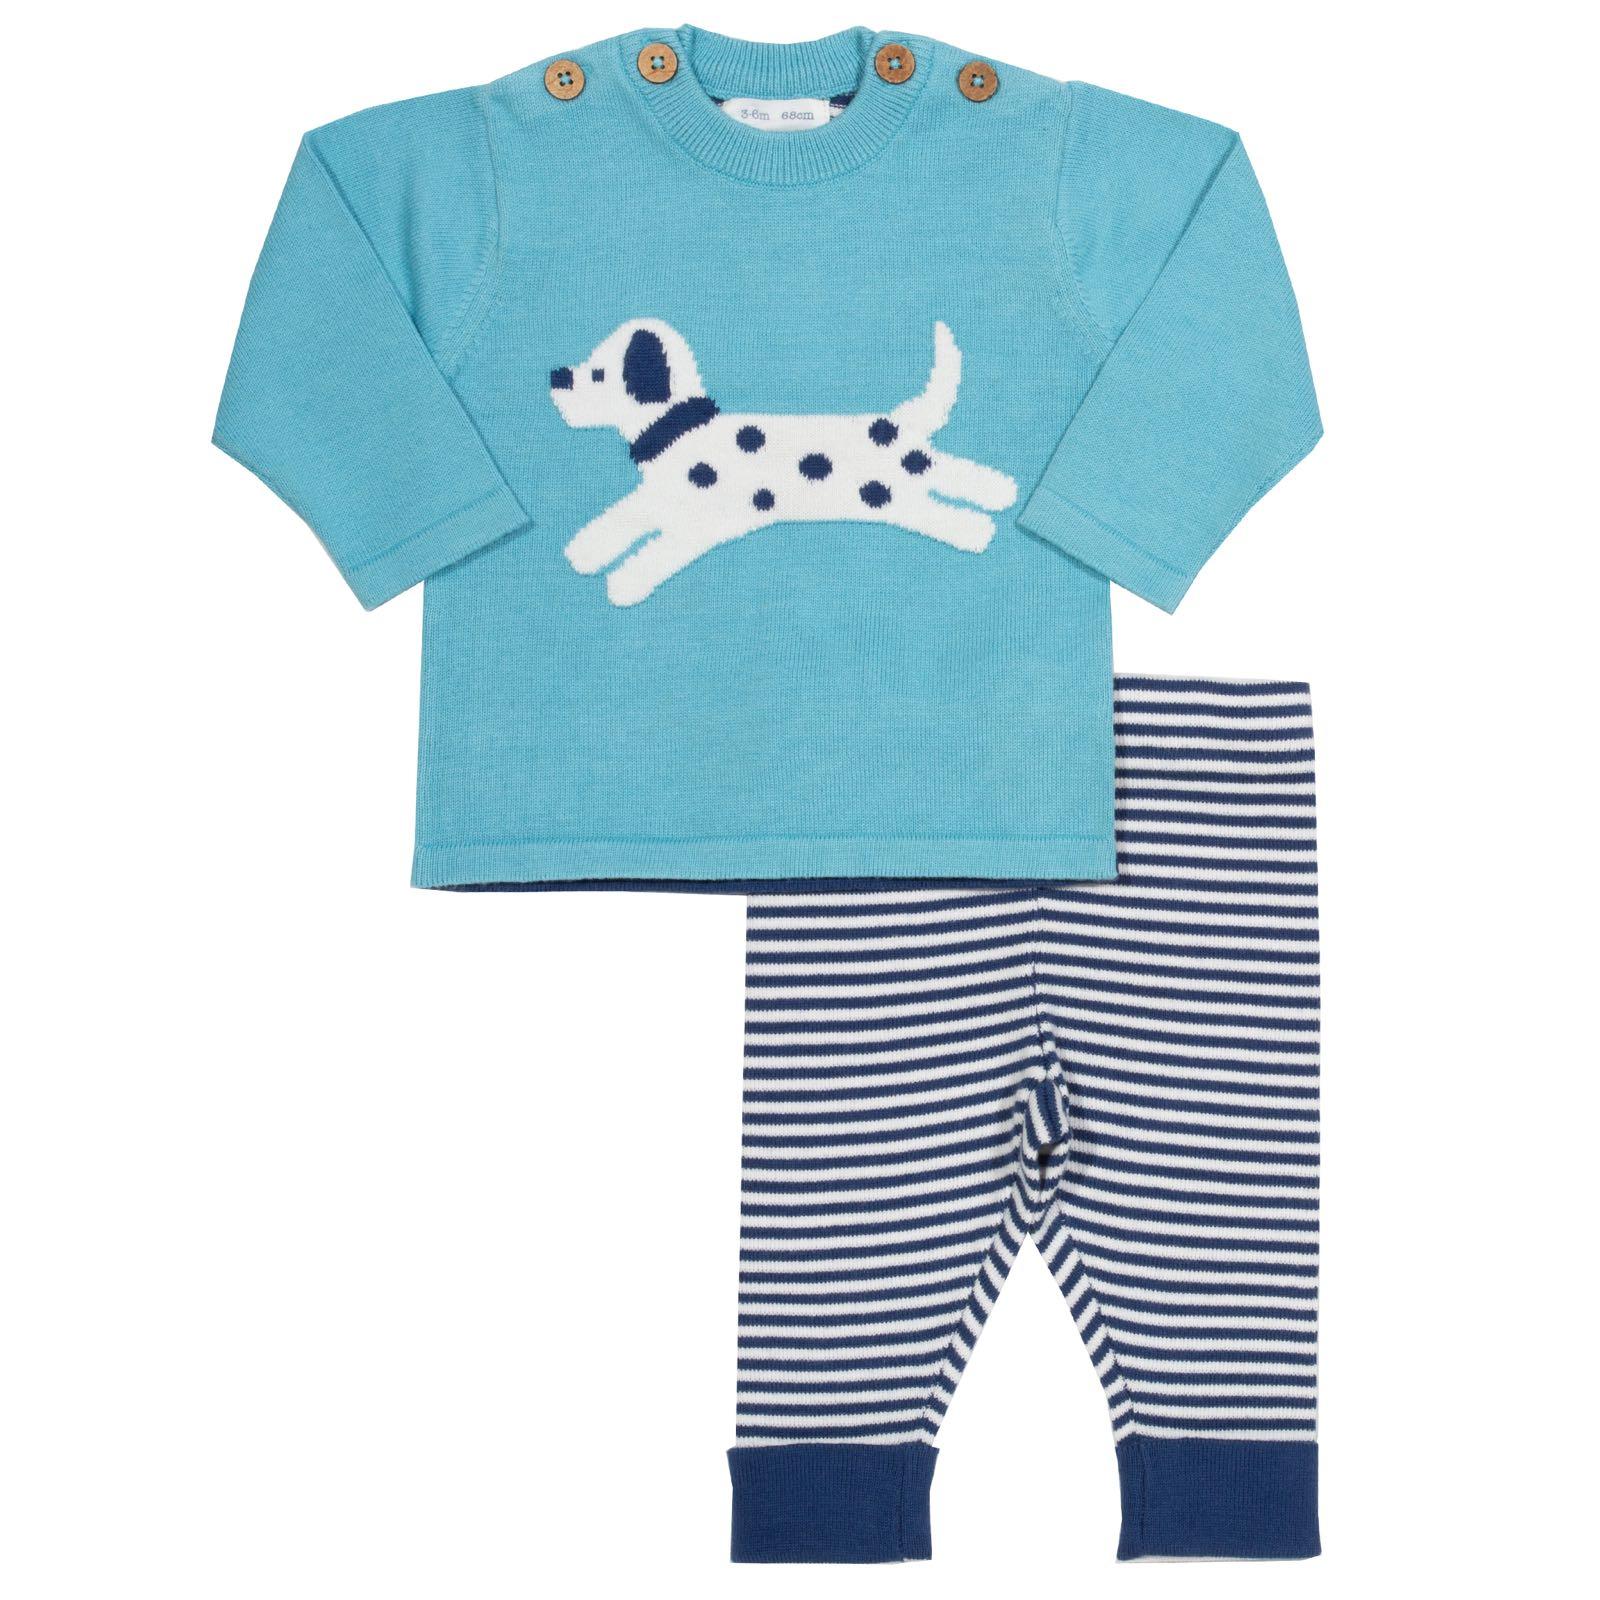 Kite Little Pup Knit Set